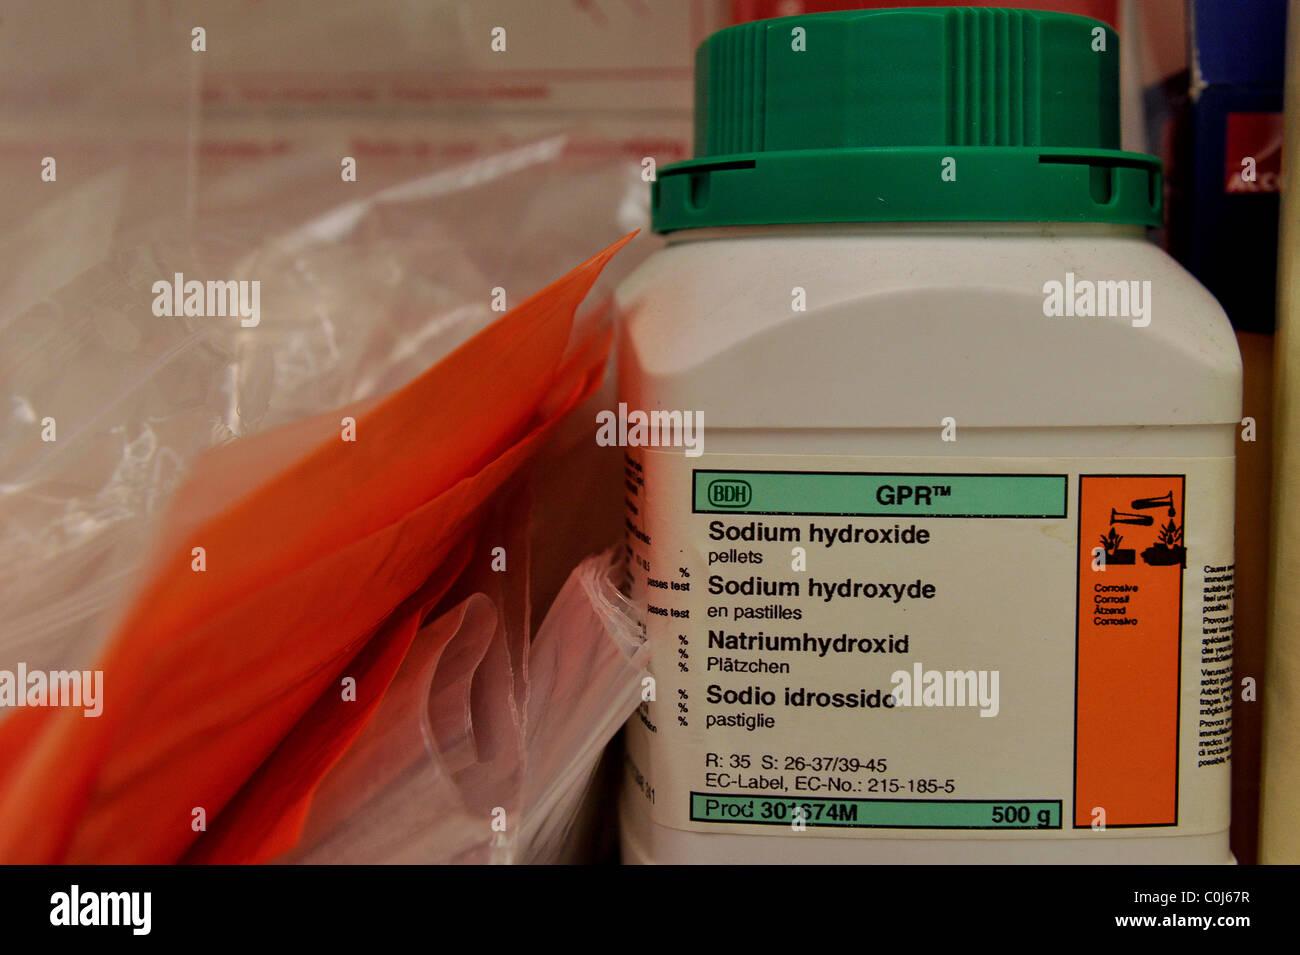 Chemicals On Shelf Stock Photos & Chemicals On Shelf Stock